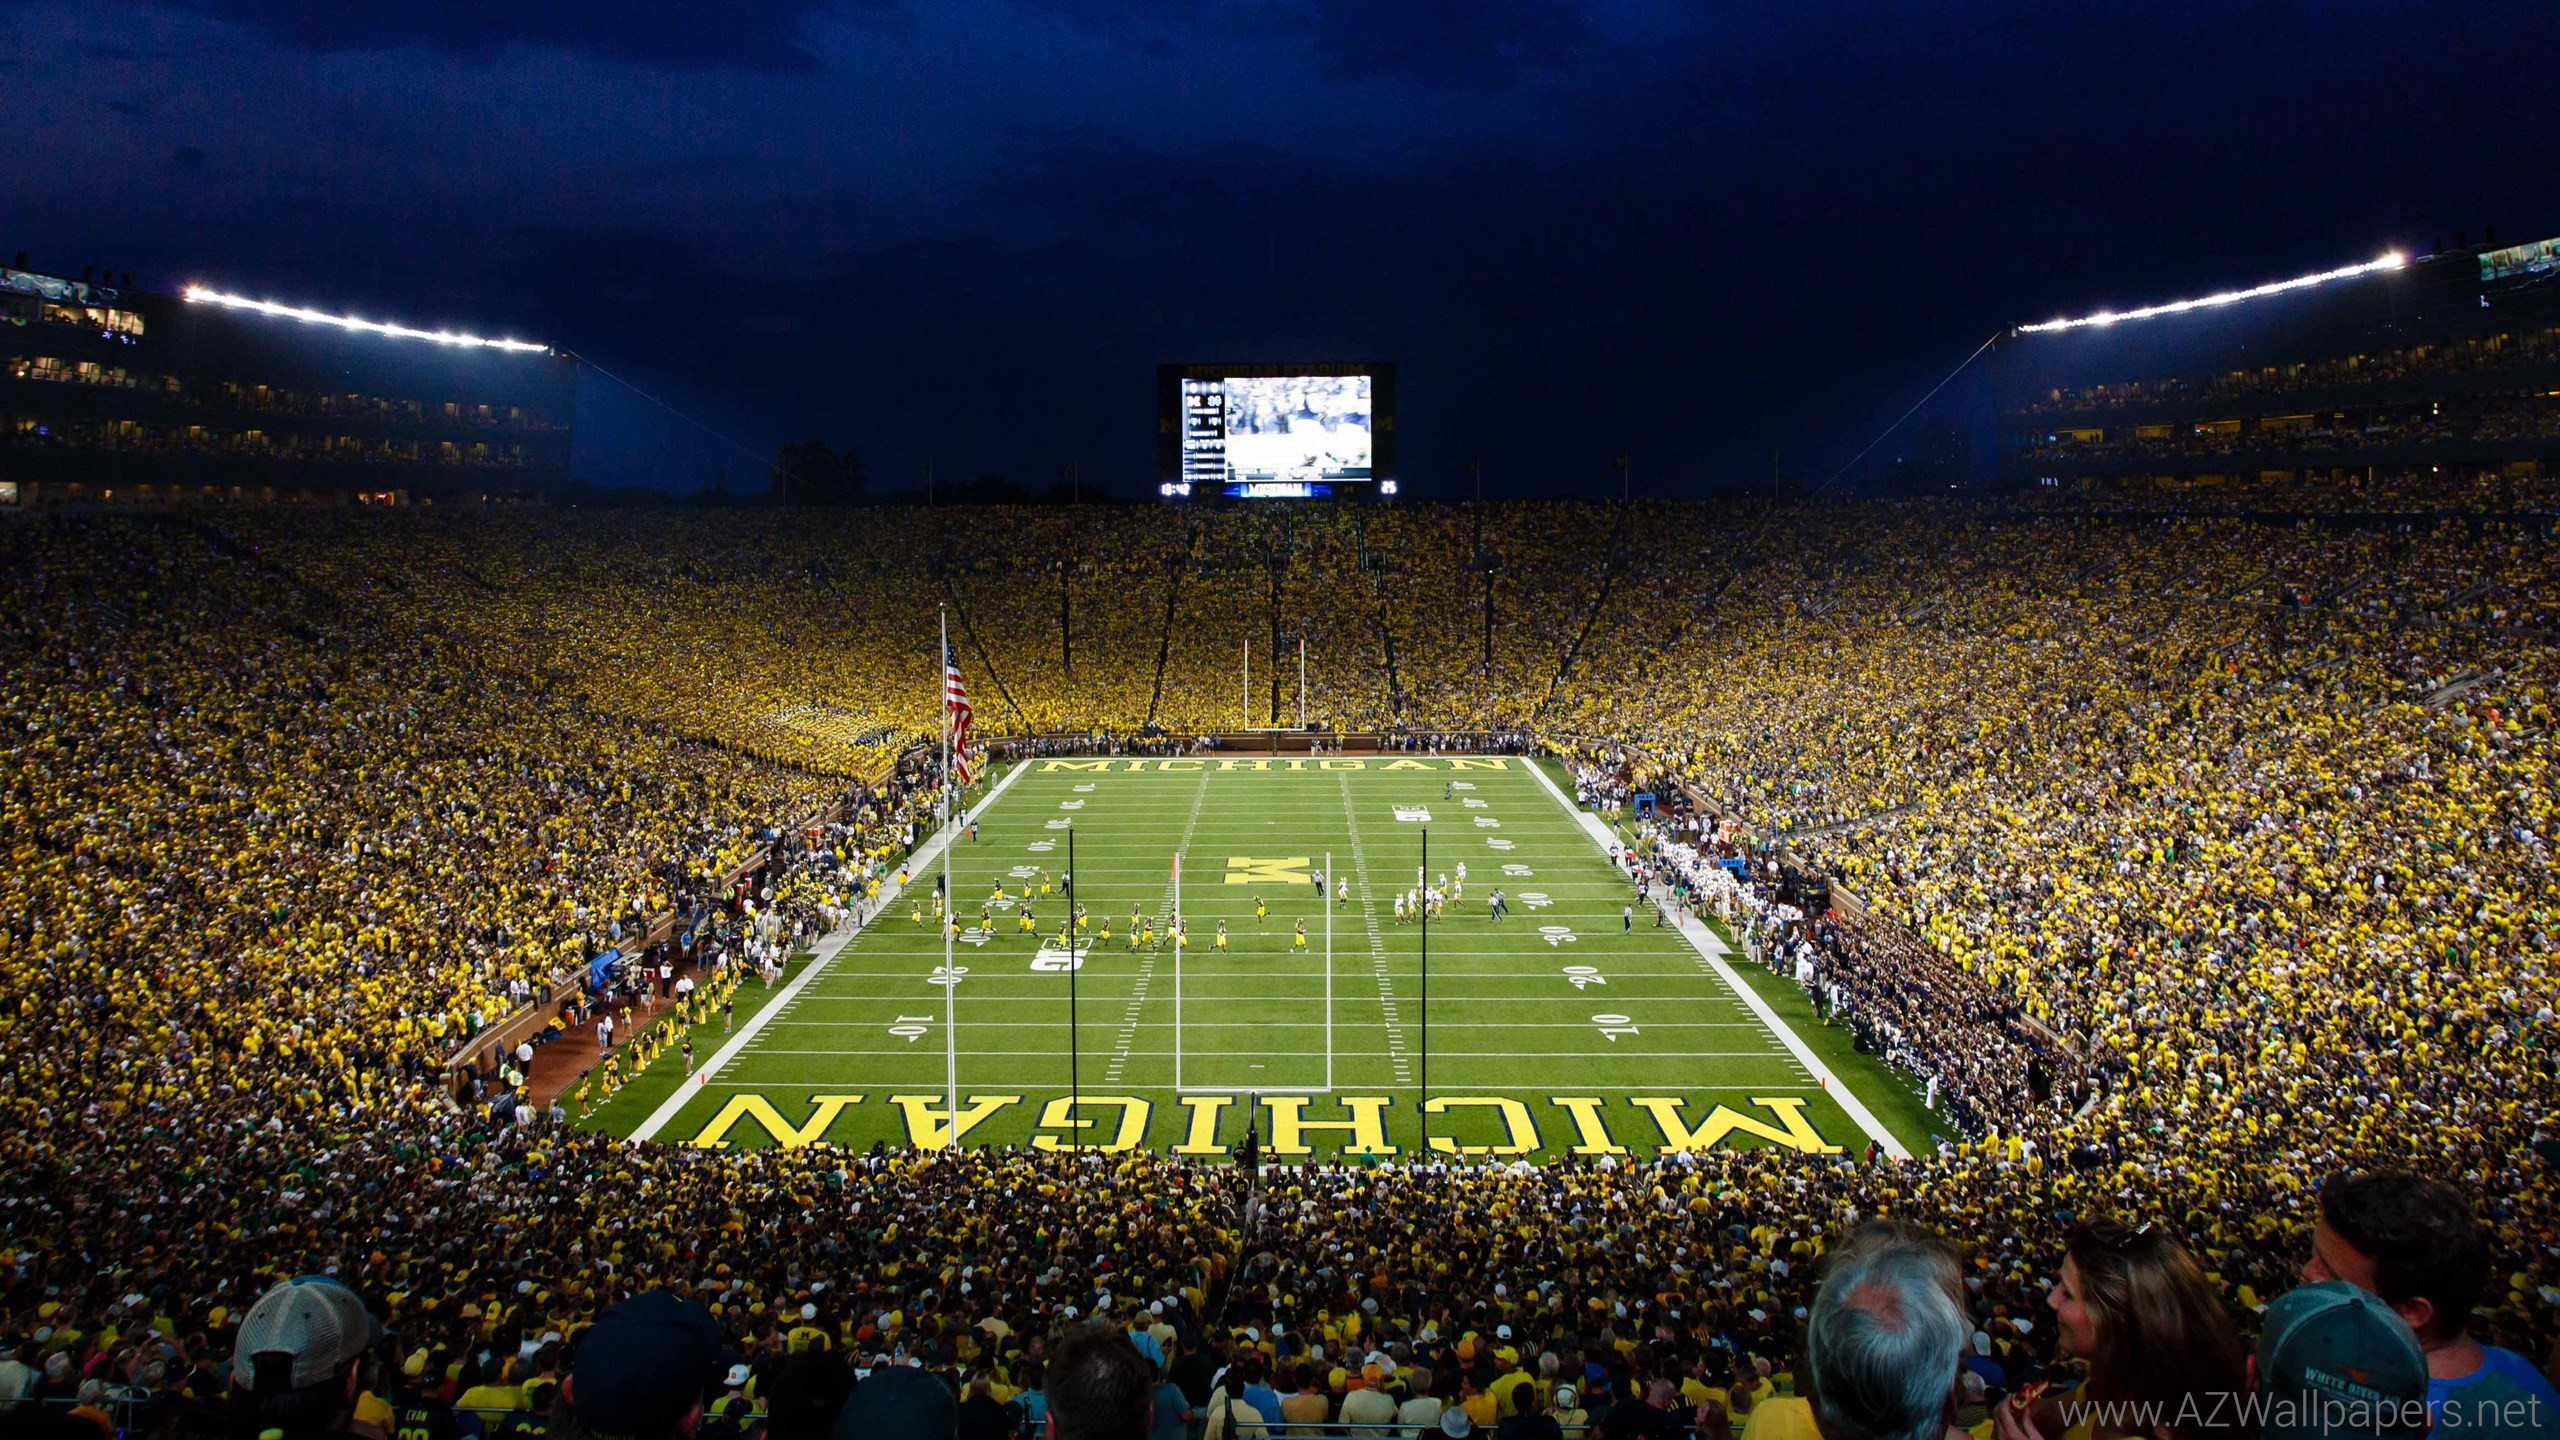 University of Michigan HD Wallpaper 2560×1440